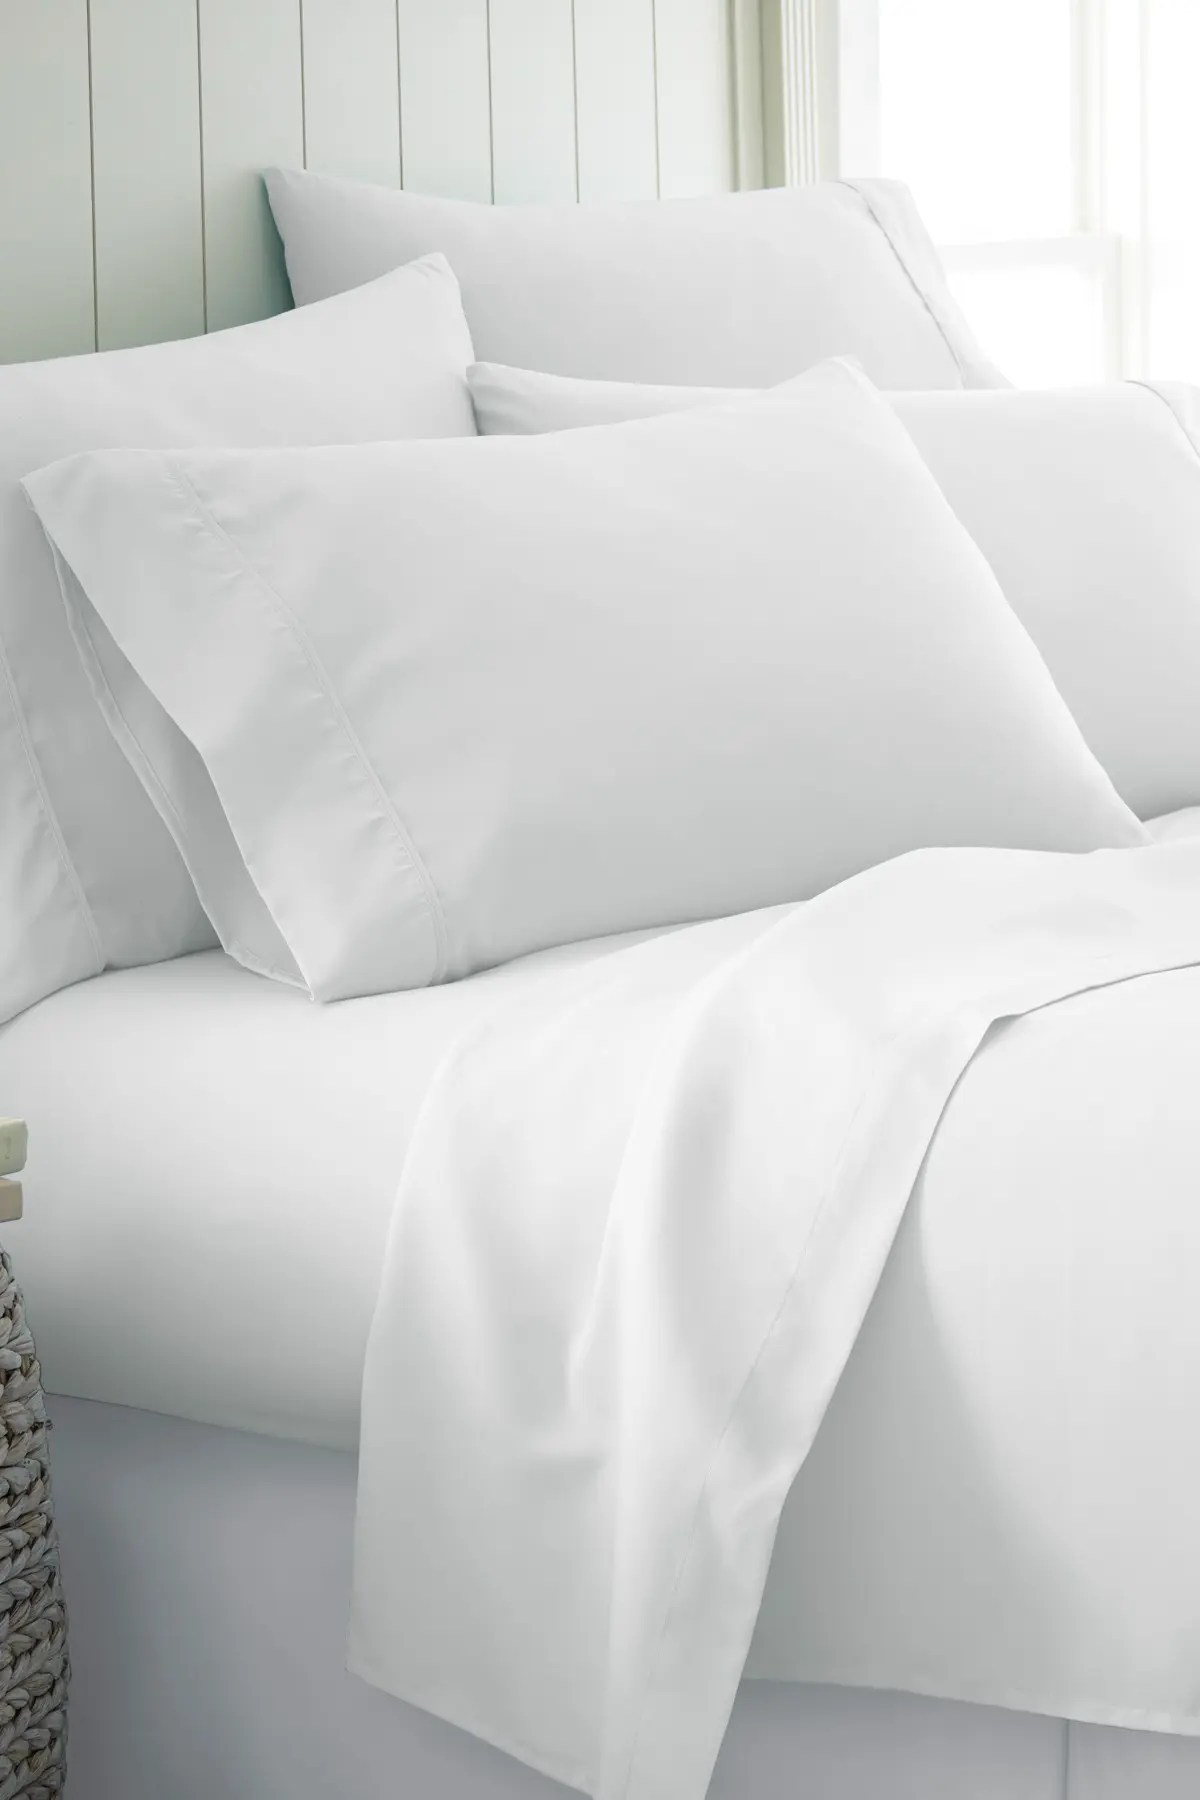 ienjoy home queen hotel collection premium ultra soft 6 piece bed sheet set white nordstrom rack